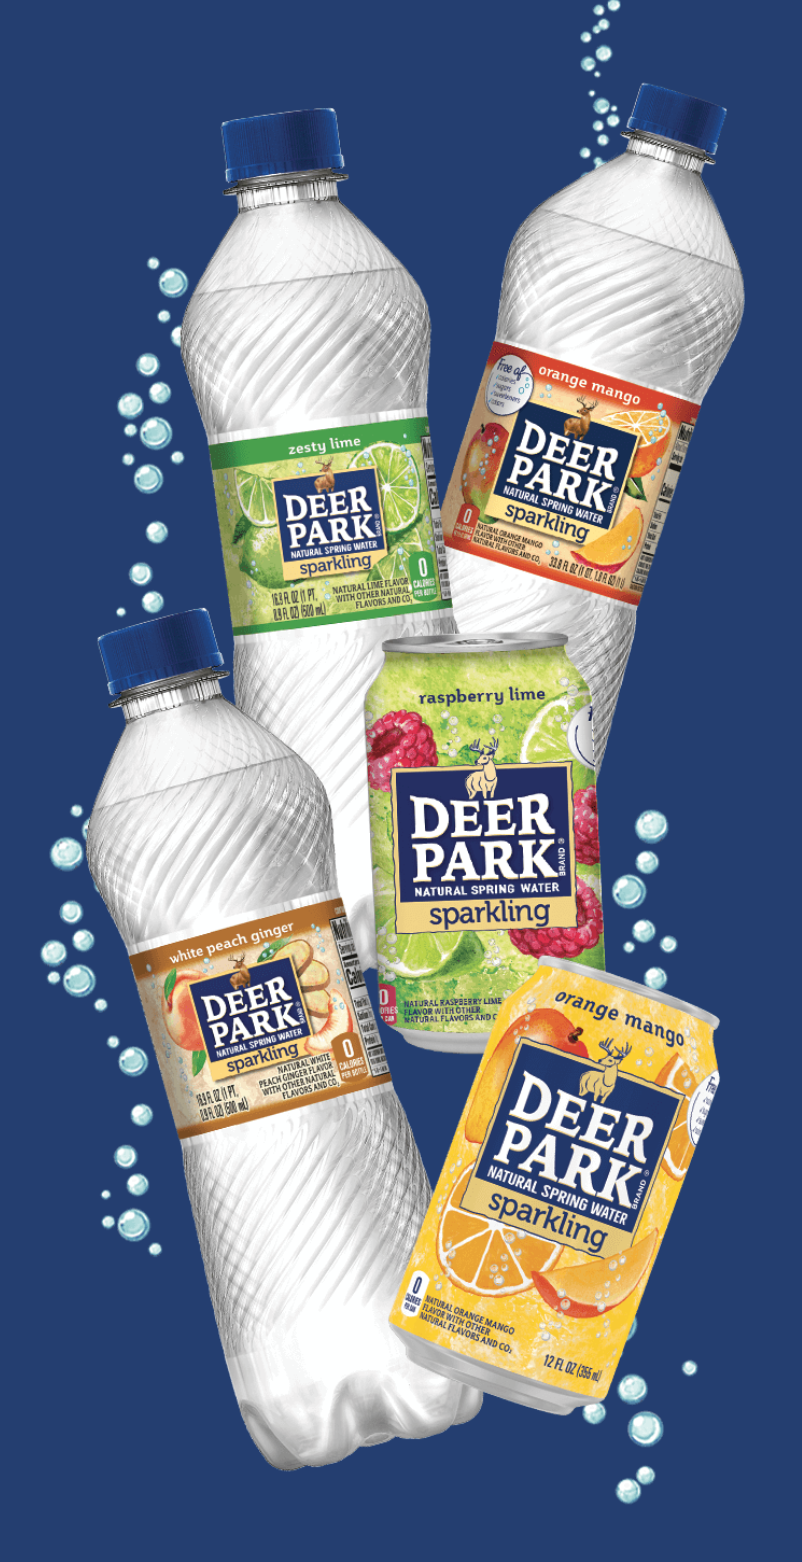 Free 8 Pack Of Deer Park Brand Sparkling Natural Spring Water Natural Spring Water Free Stuff By Mail Deer Park Water